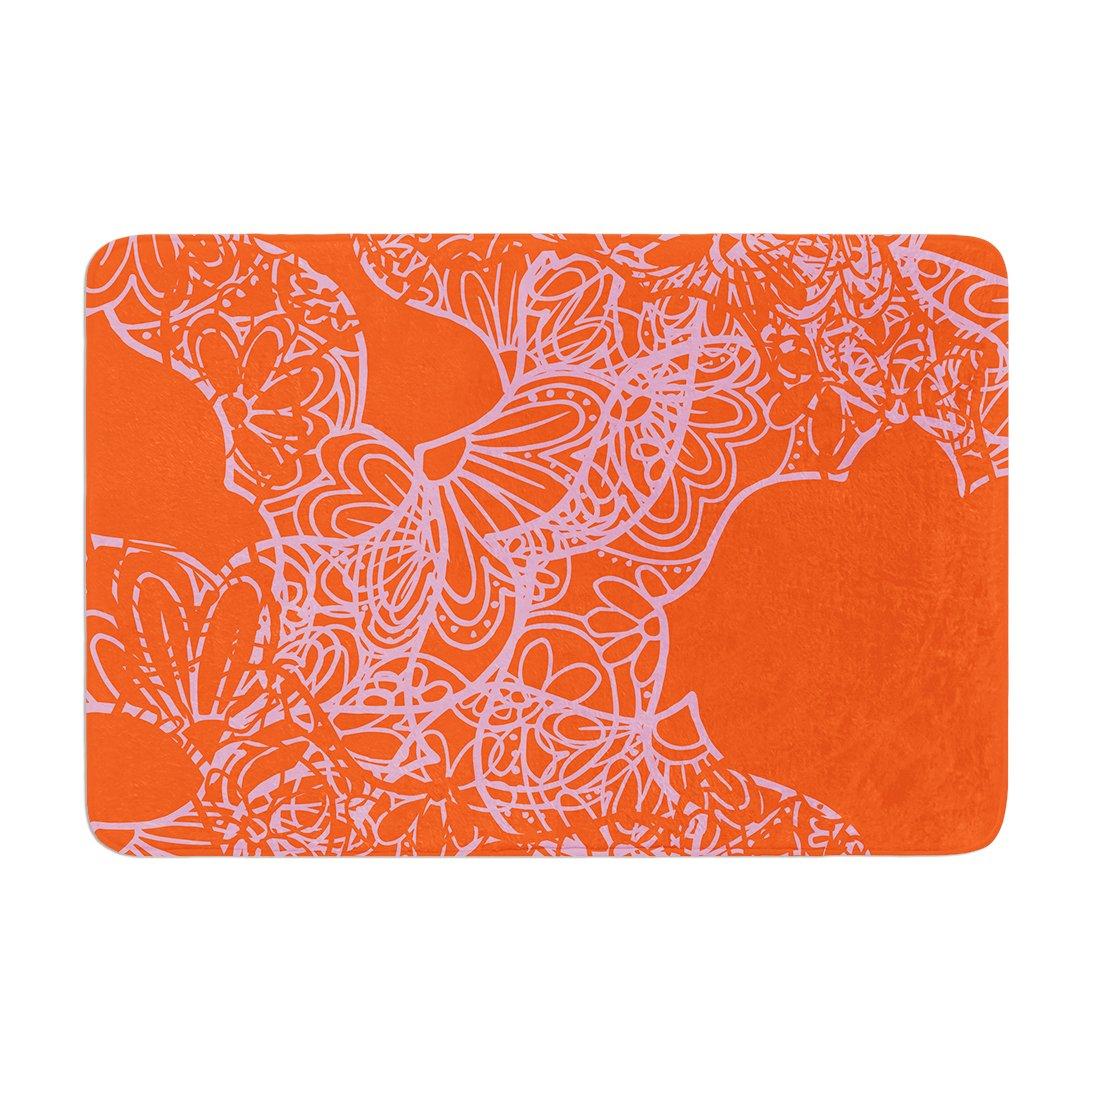 Kess InHouse Patternmuse Mandala Pumpkin Orange Pink Memory Foam Bath Mat 17 by 24